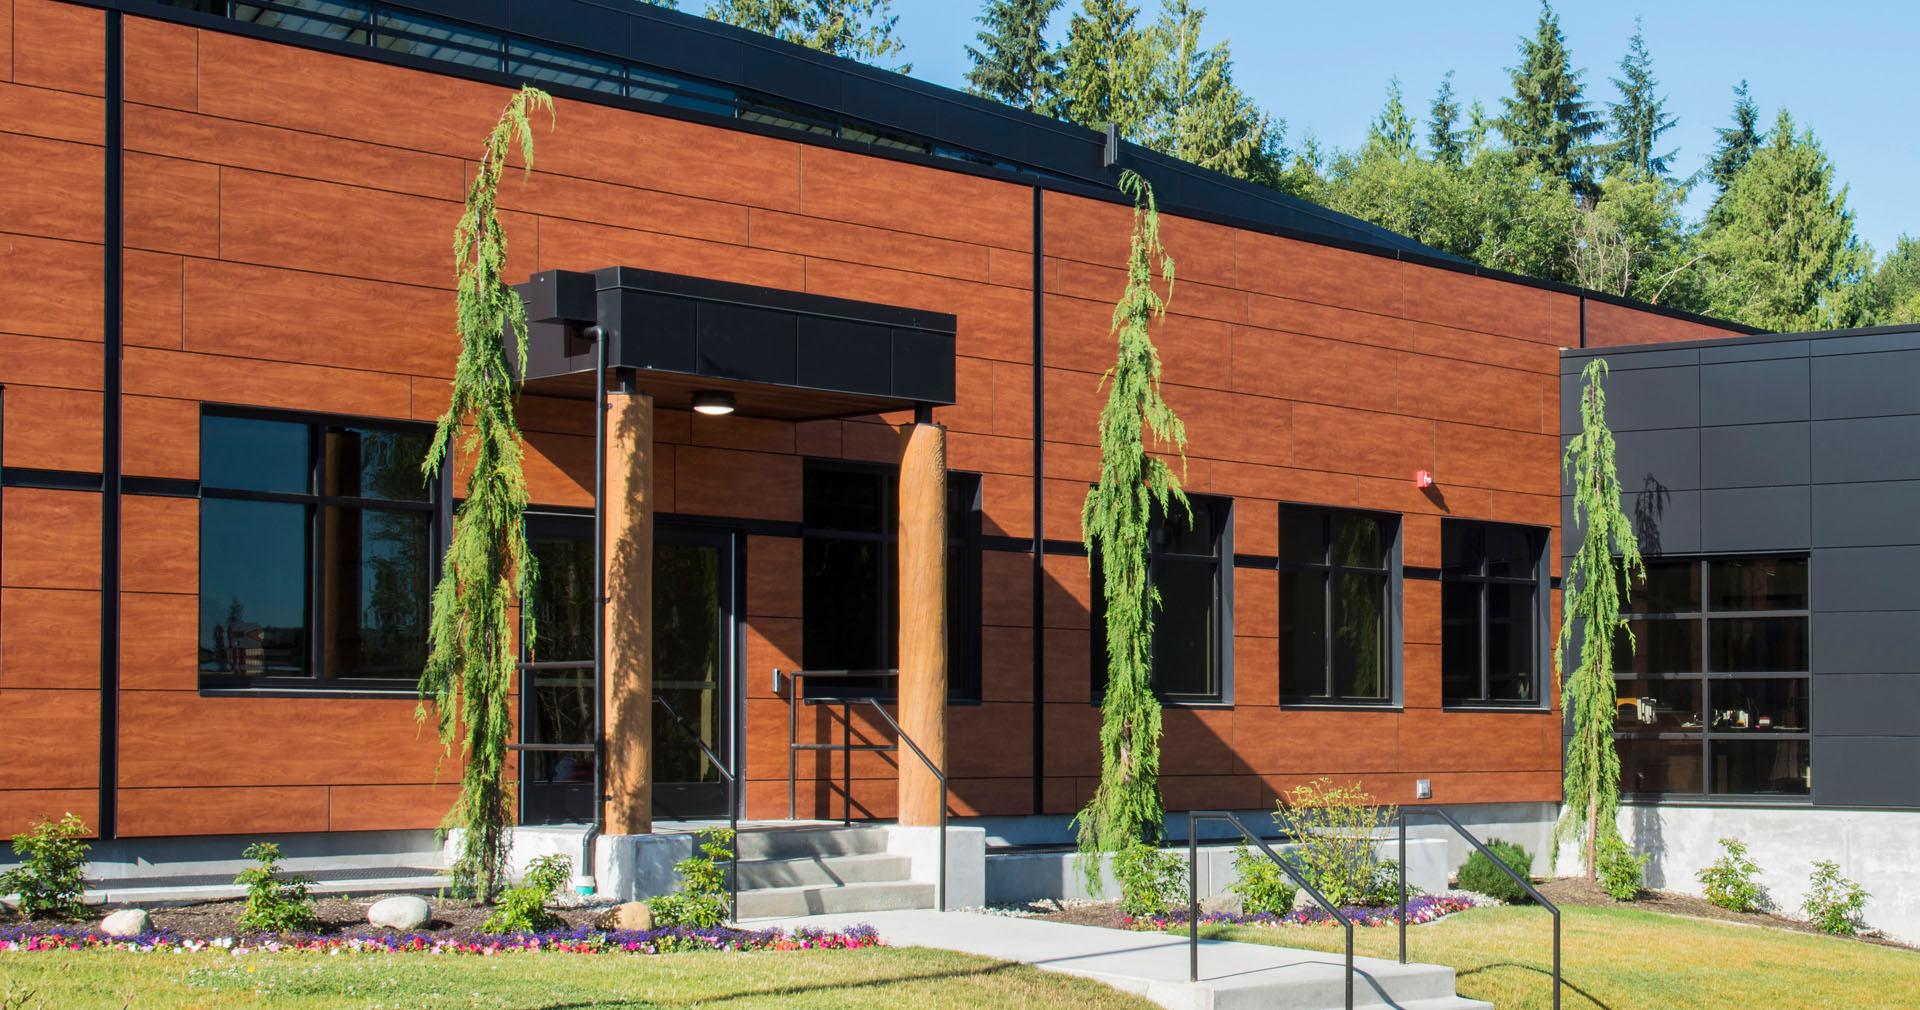 Stonewood Architectural Panels